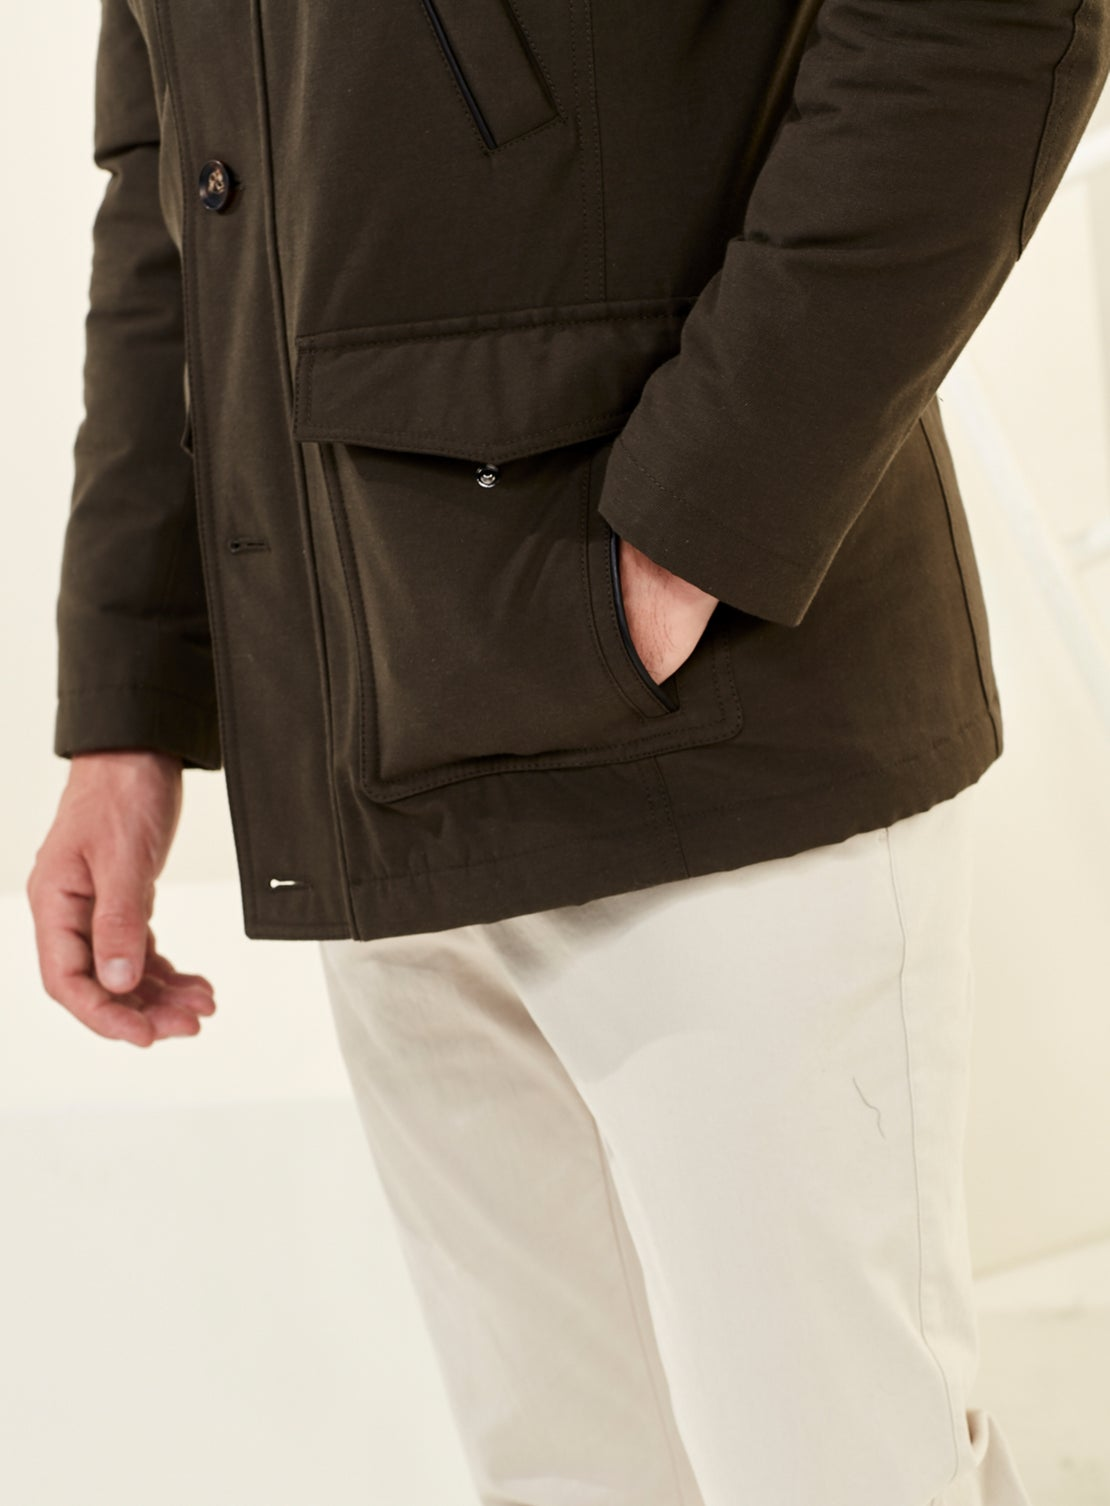 Olive Green Twill Military Jacket